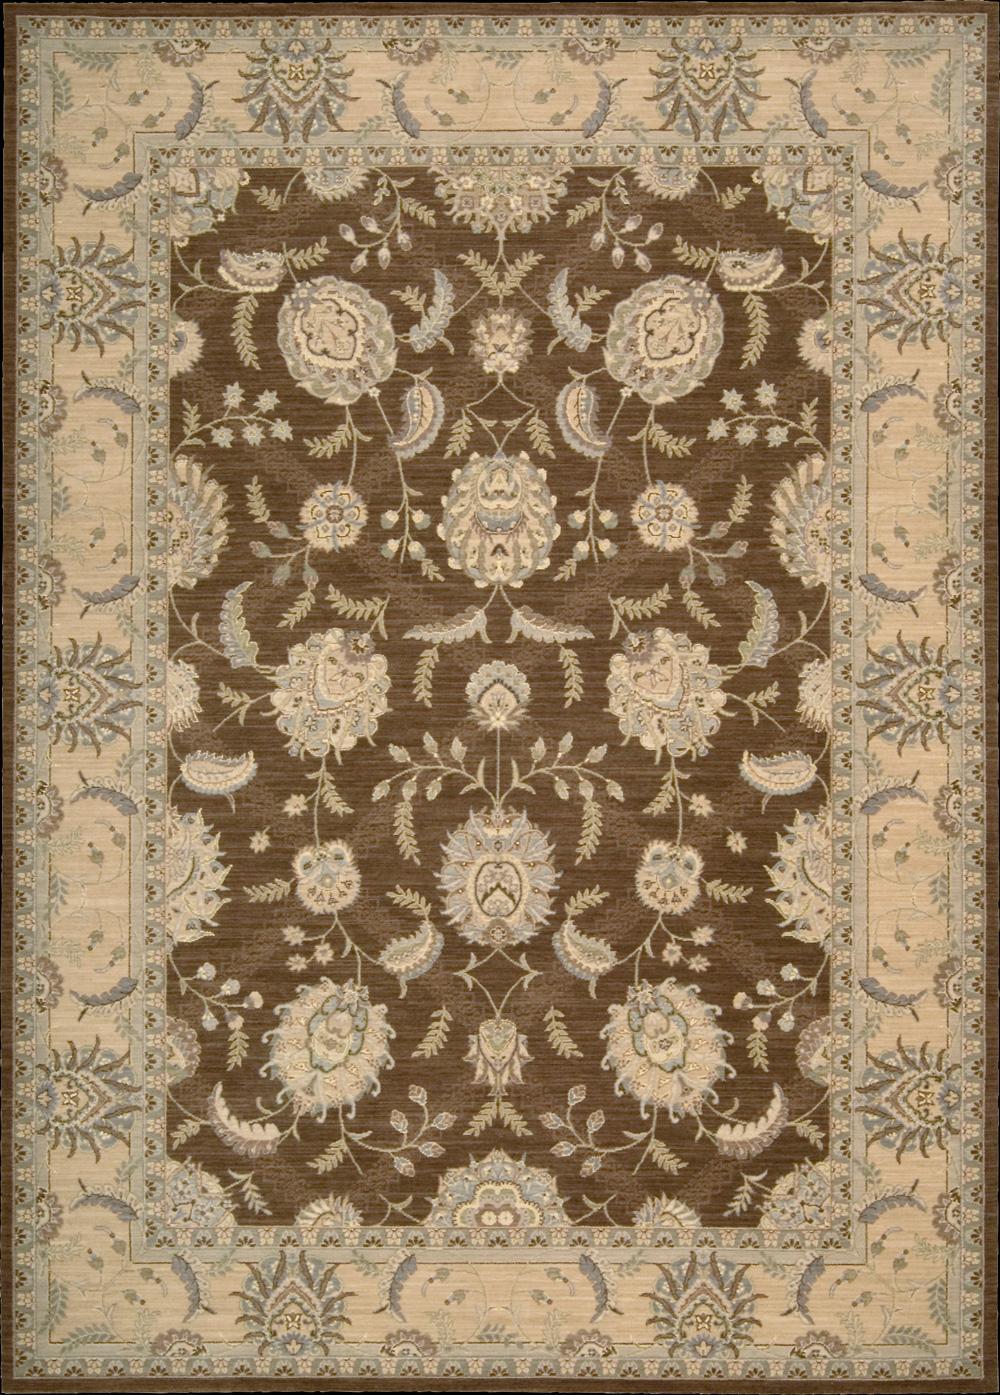 Nourison Persian Empire Area Rug 12' x 15' - Item Number: 25743